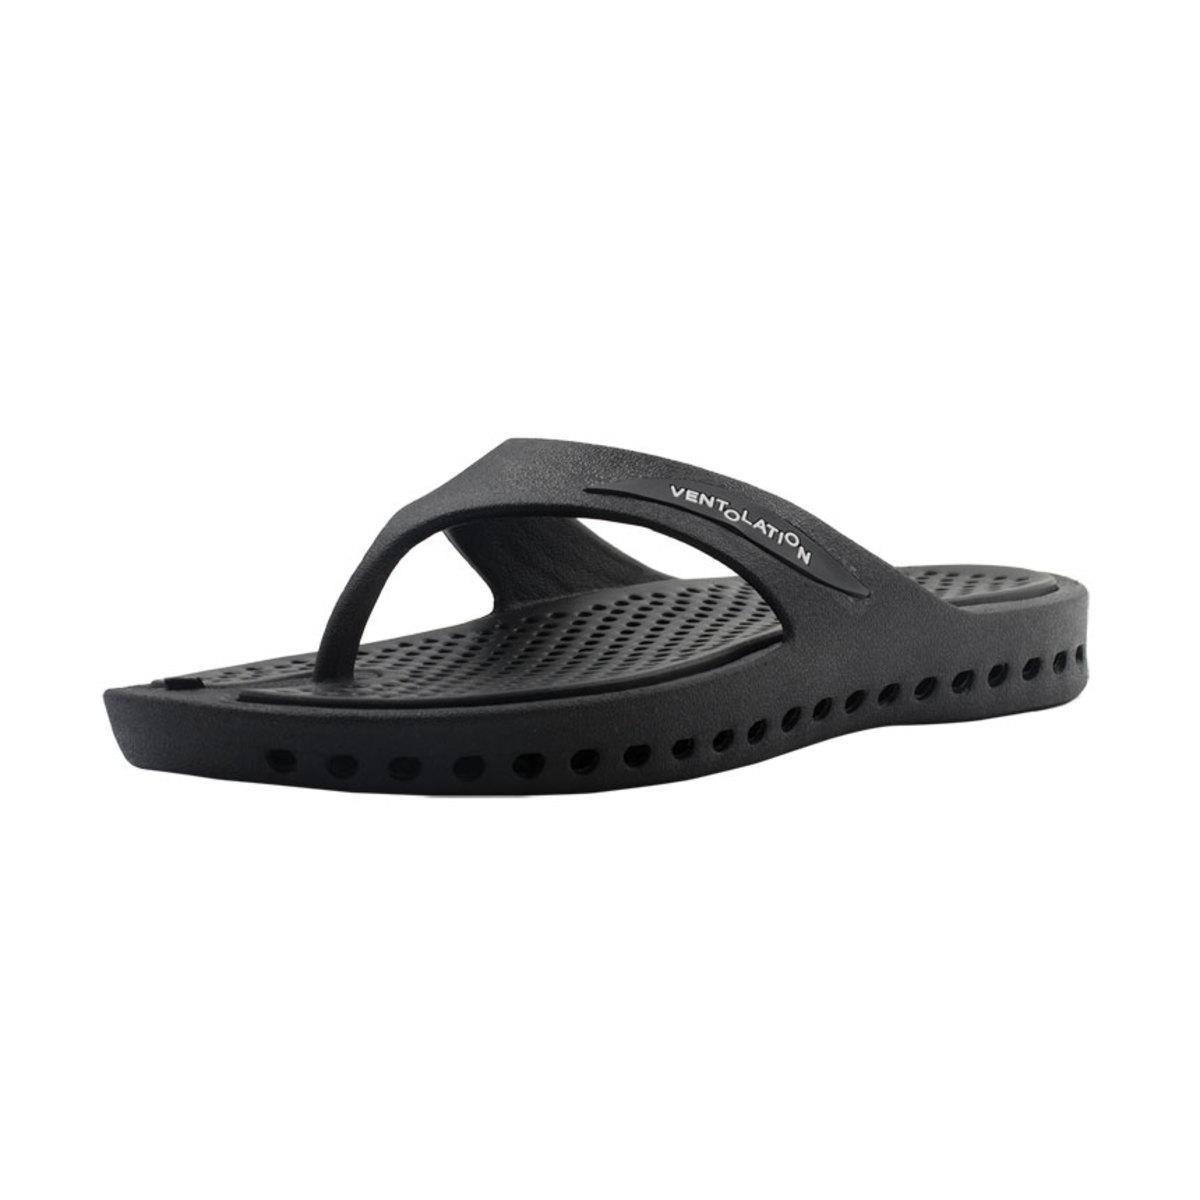 ventolation-sandal